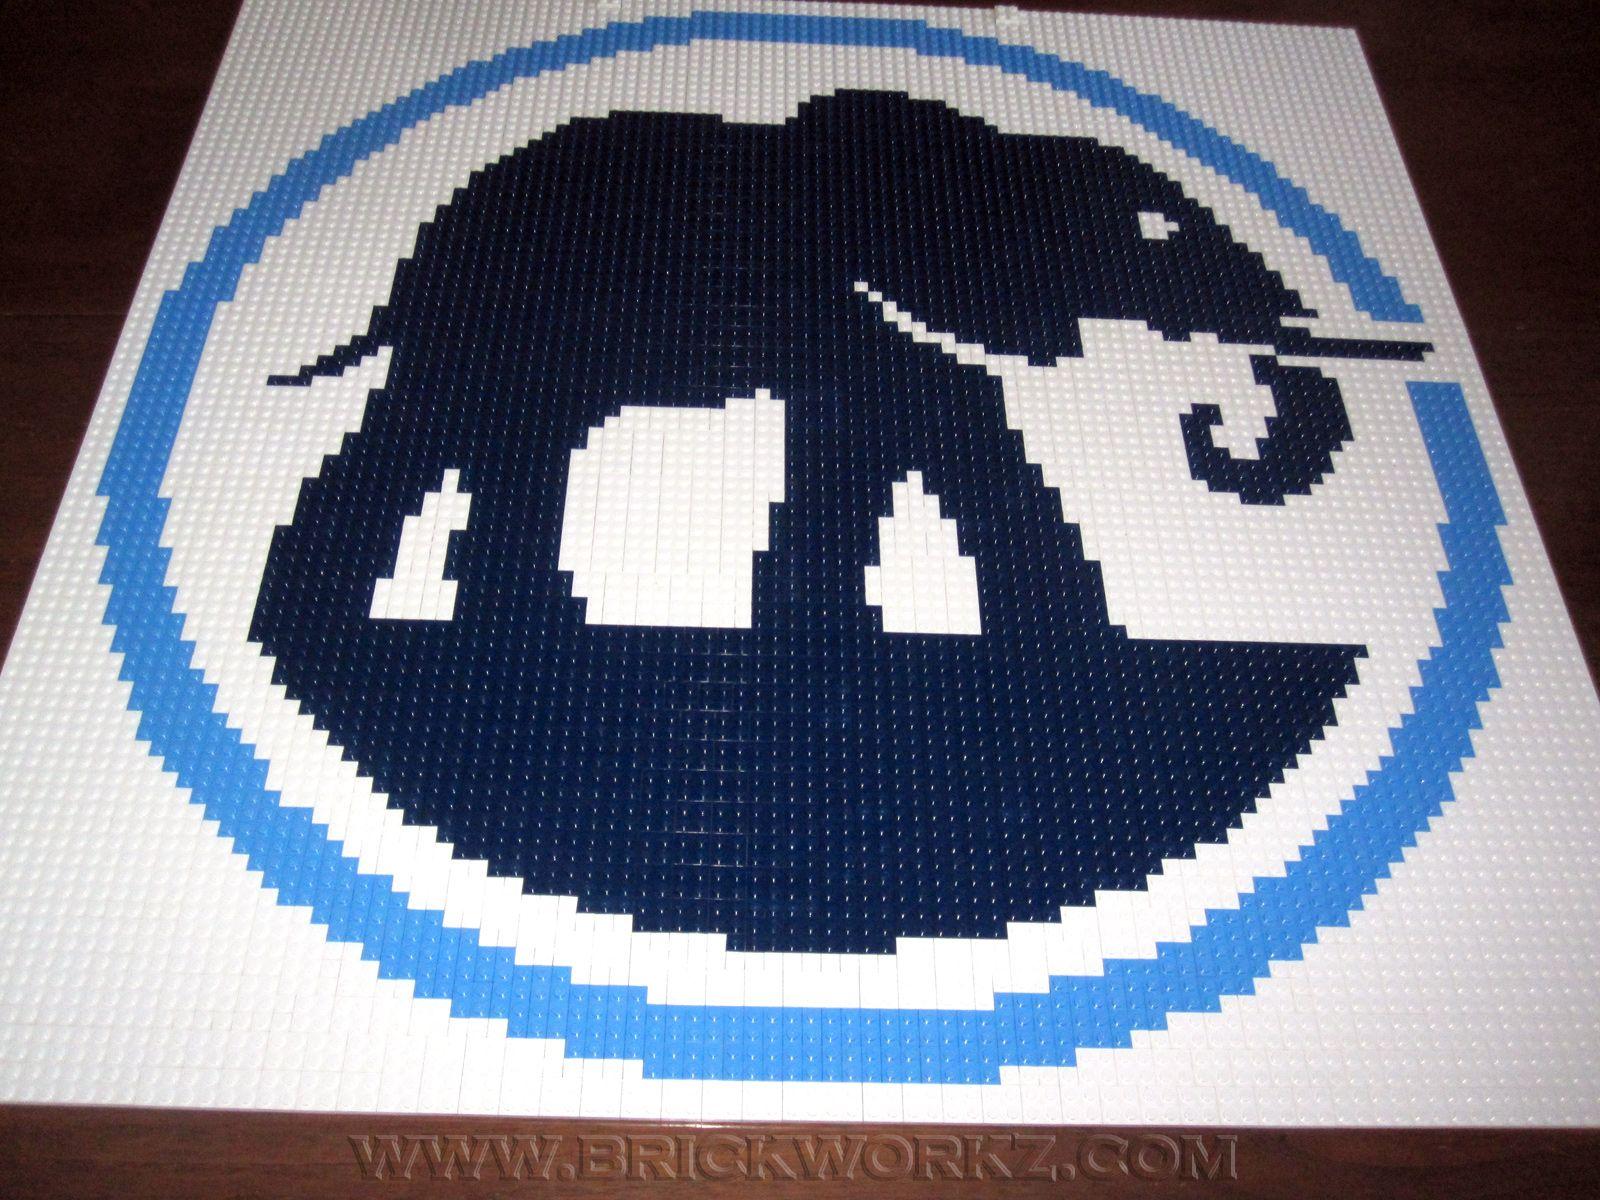 Elephant Auto Insurance 30 X 30 Three Colors Commissioned By Elephant Auto Insurance For Their Lobby Lego Mosaic Mosaic Portrait Mosaic Art